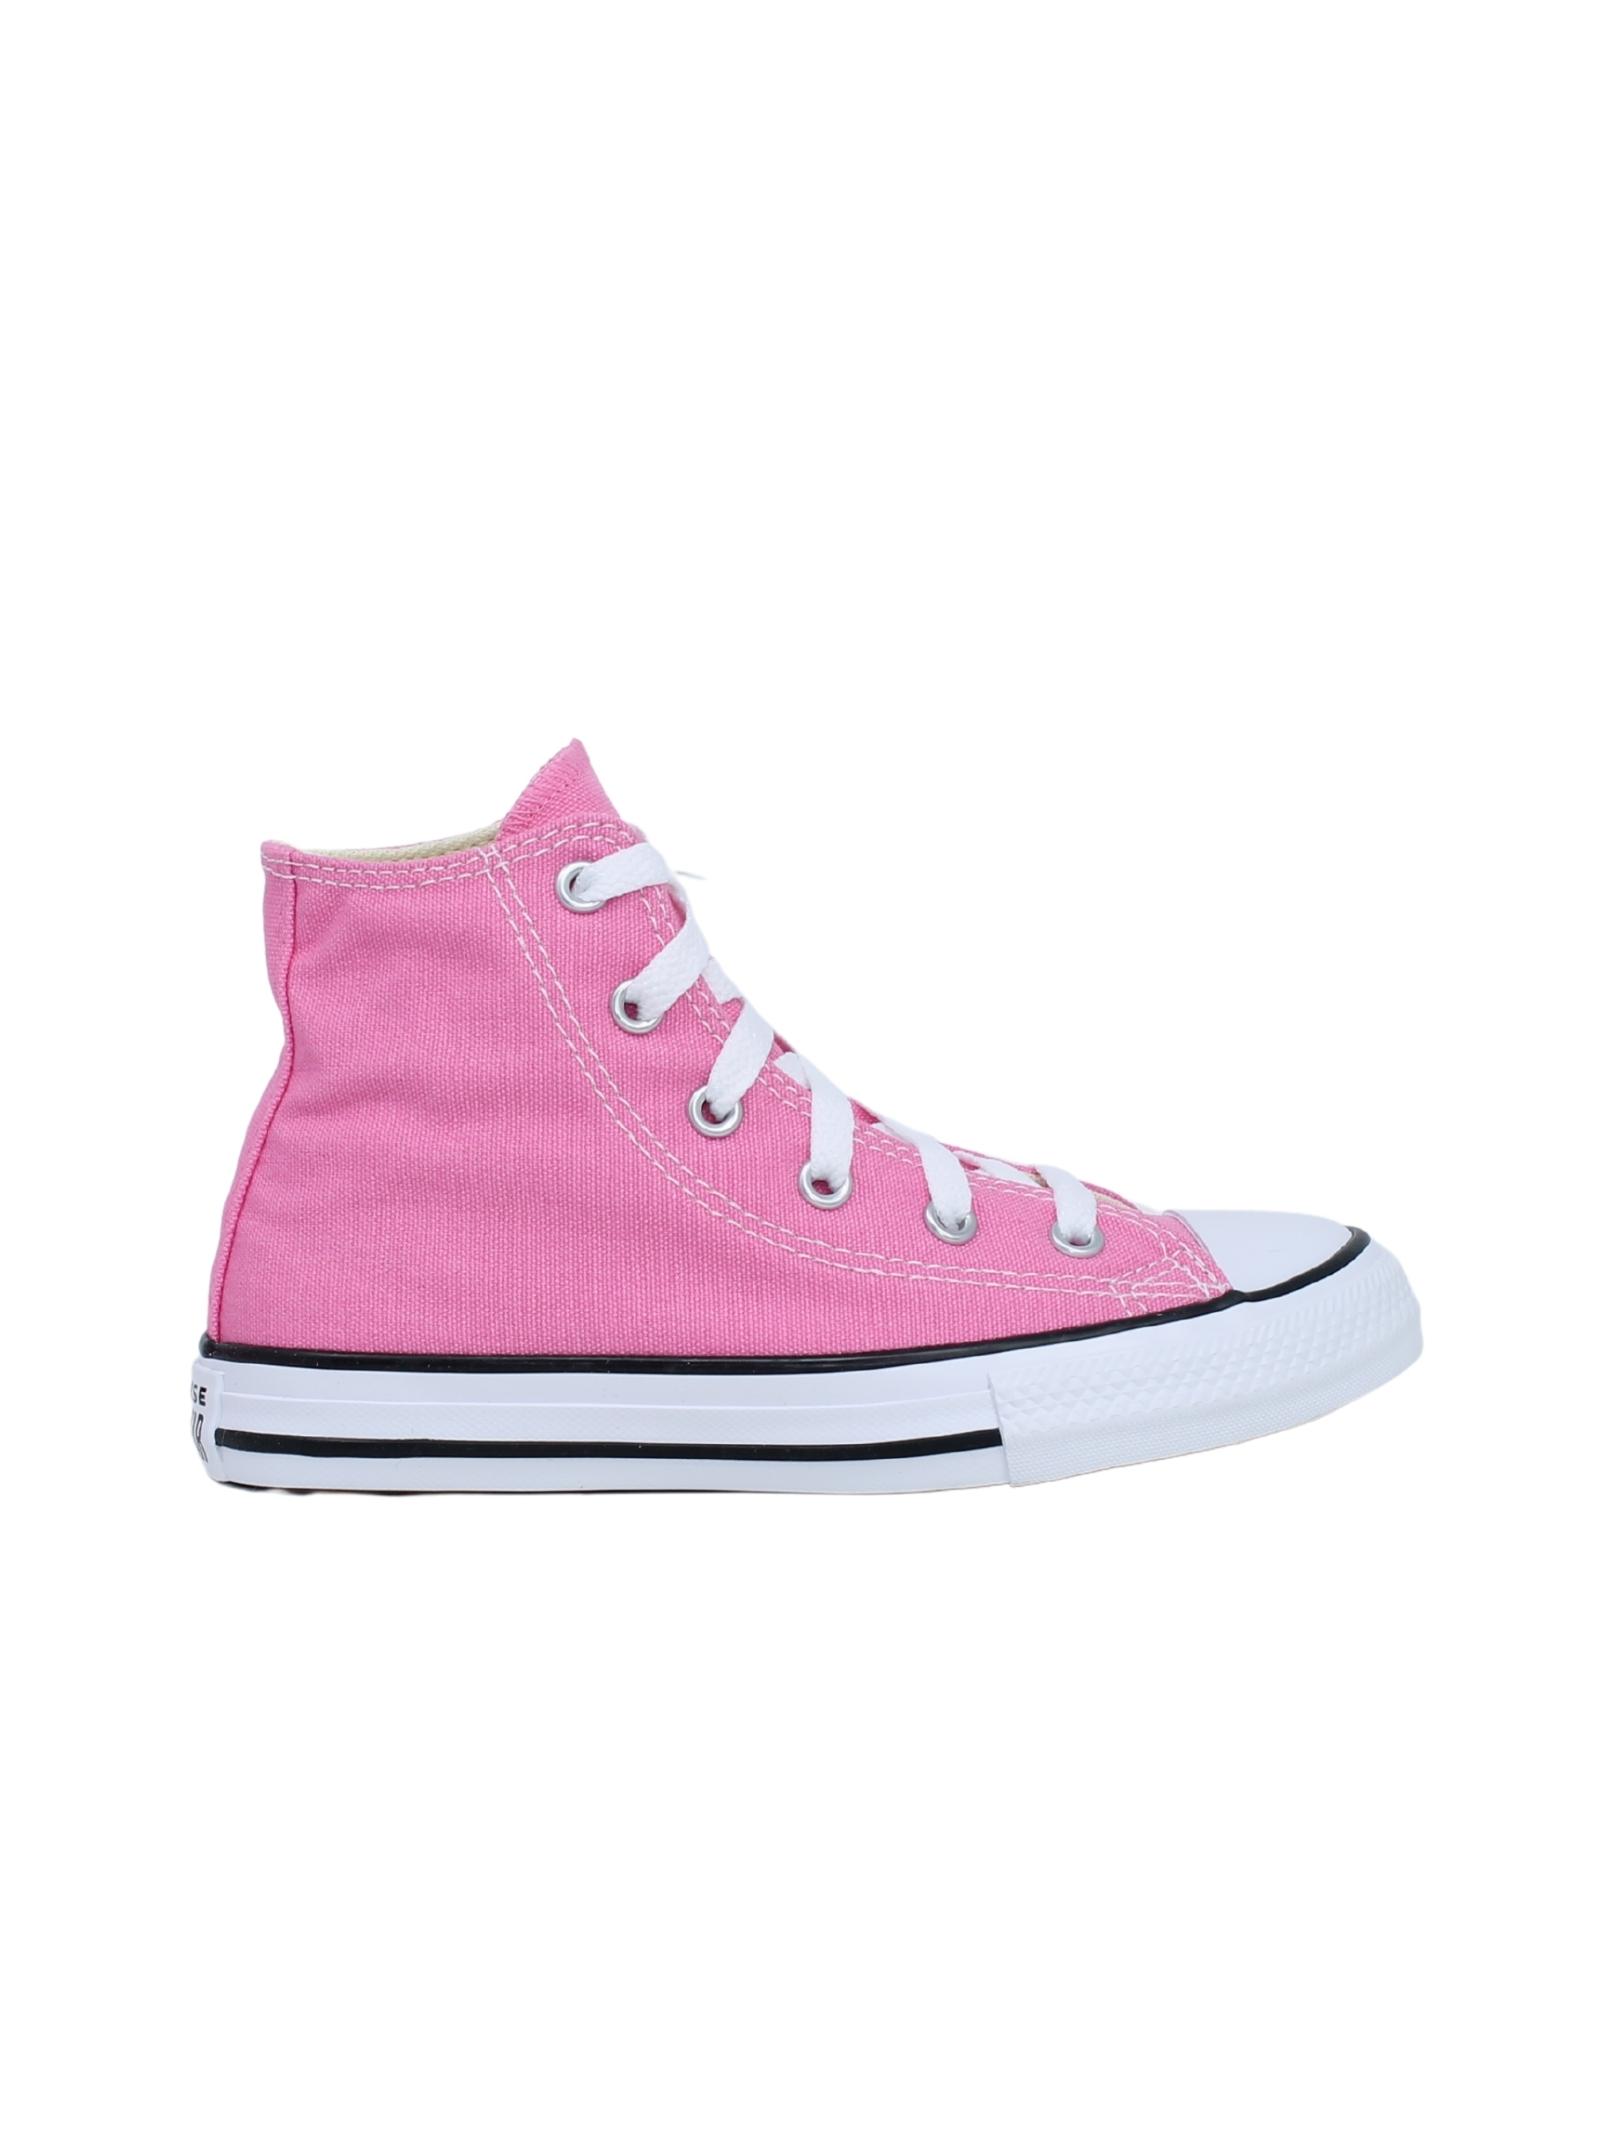 Converse Bambina Pink CONVERSE KIDS | Sneakers | 3J234CROSA